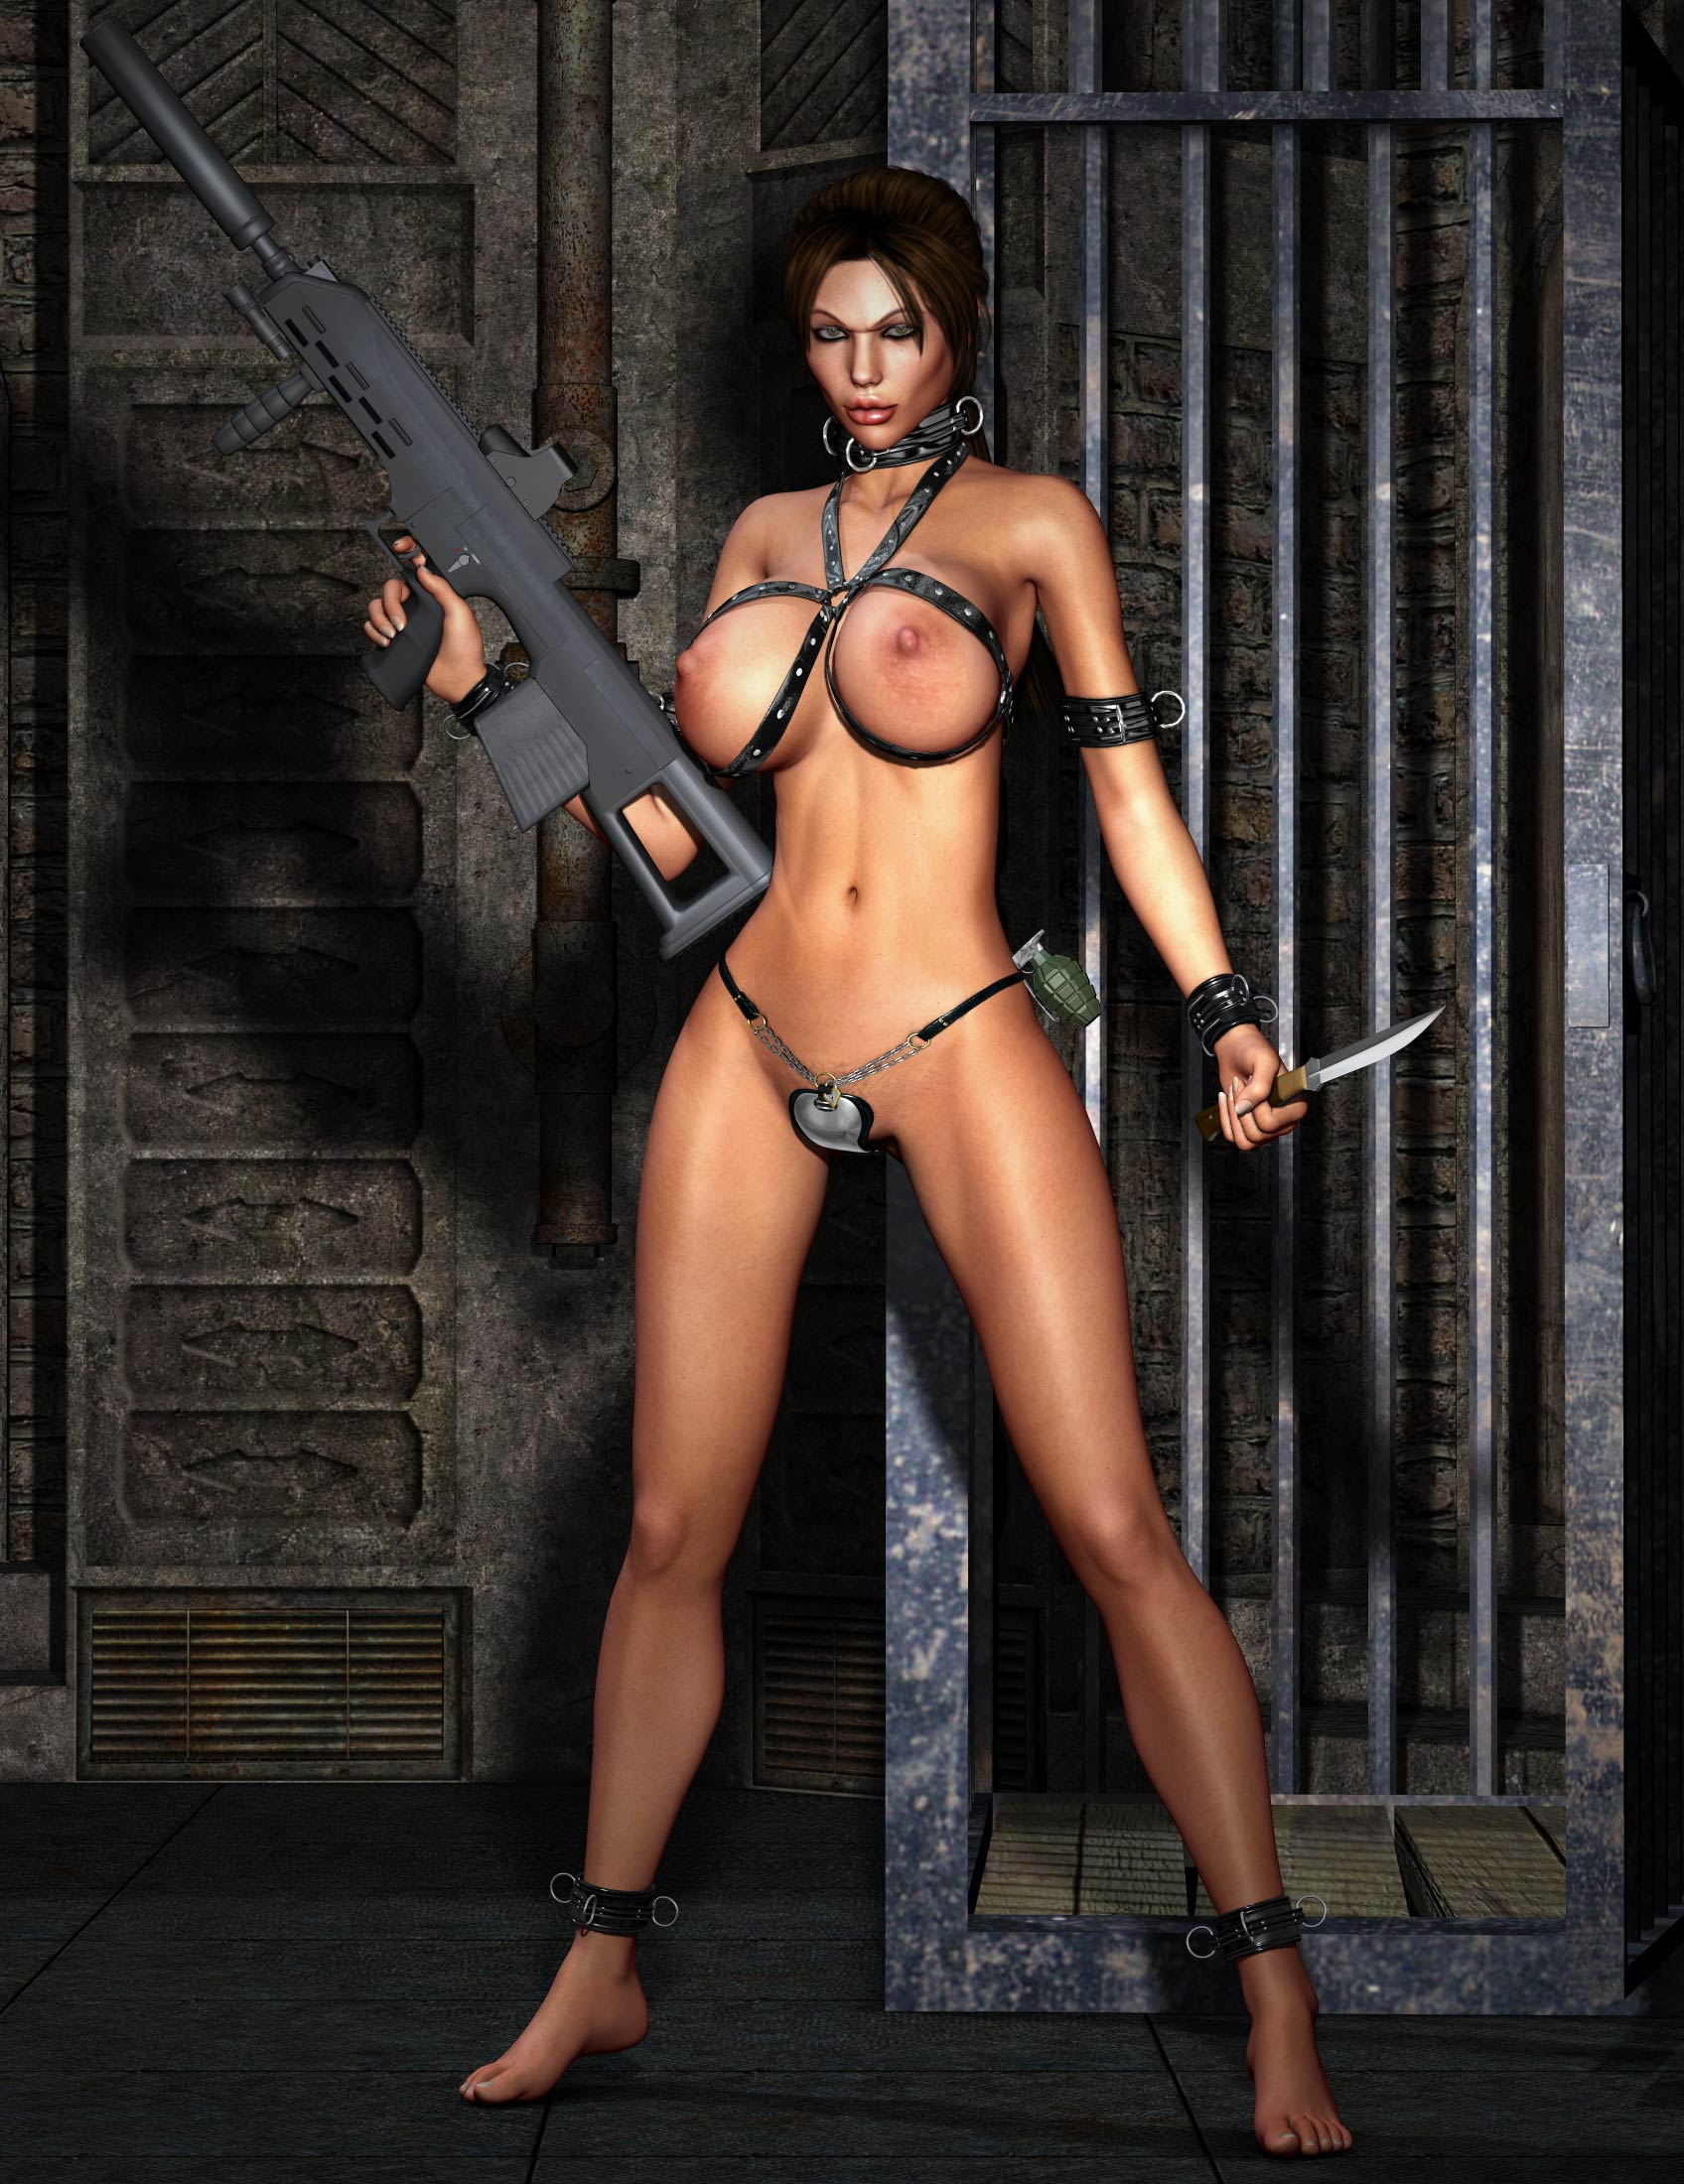 Lara croft fuly naked xxx clip